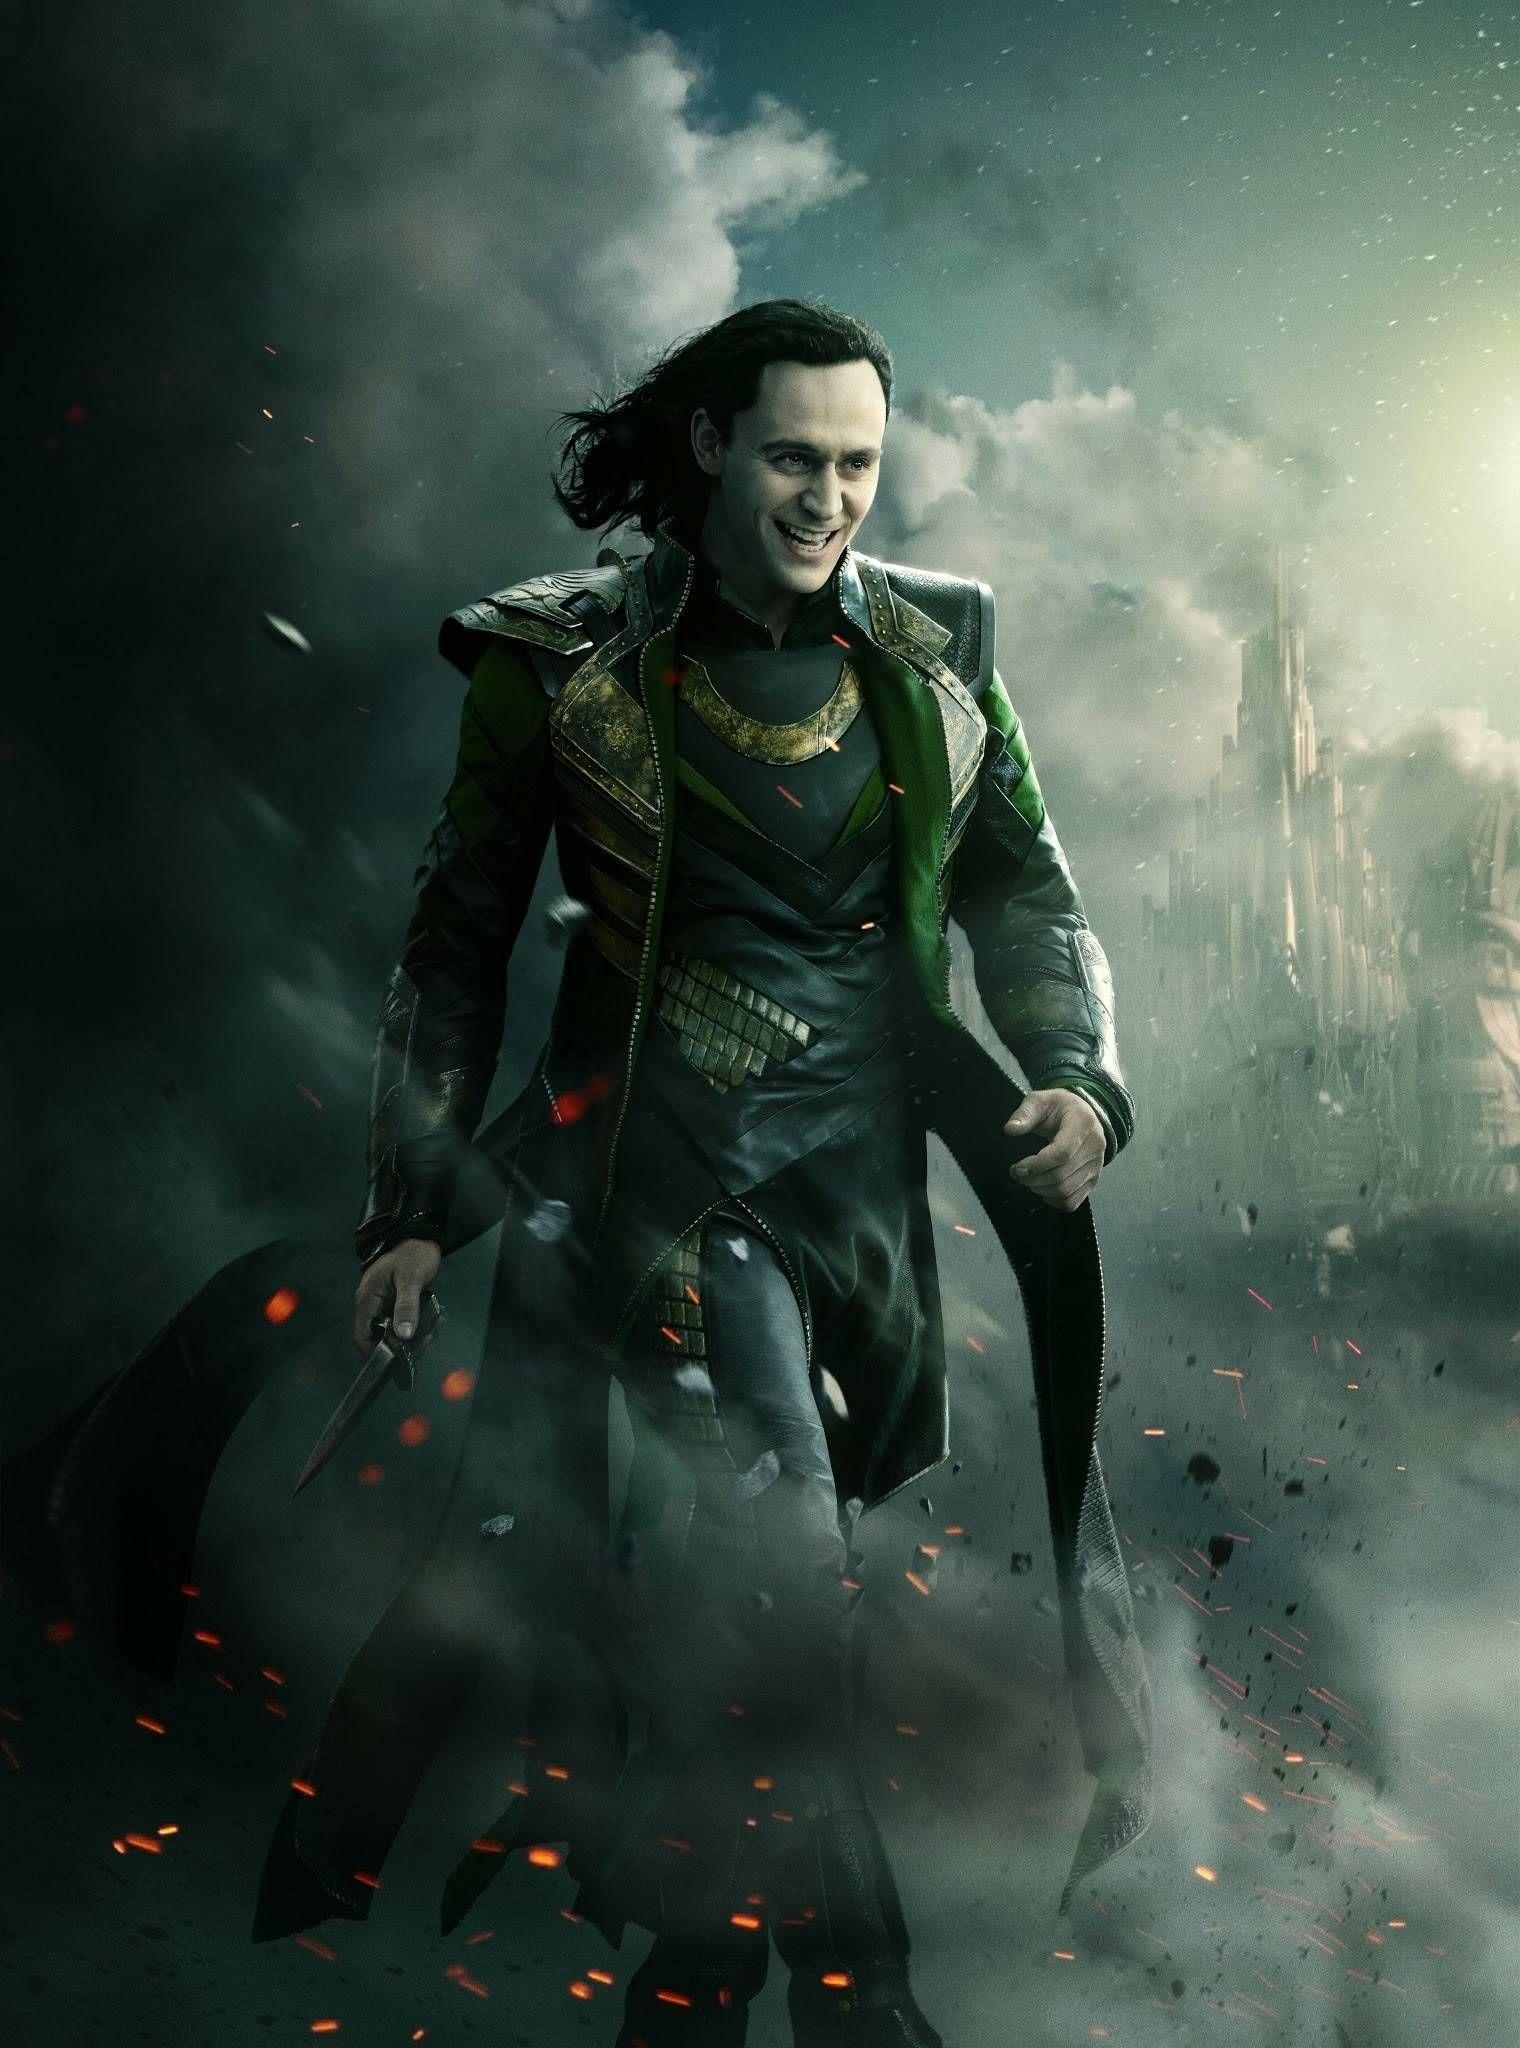 Thor Loki Thoki Thor Sfamily おしゃれまとめの人気アイデア